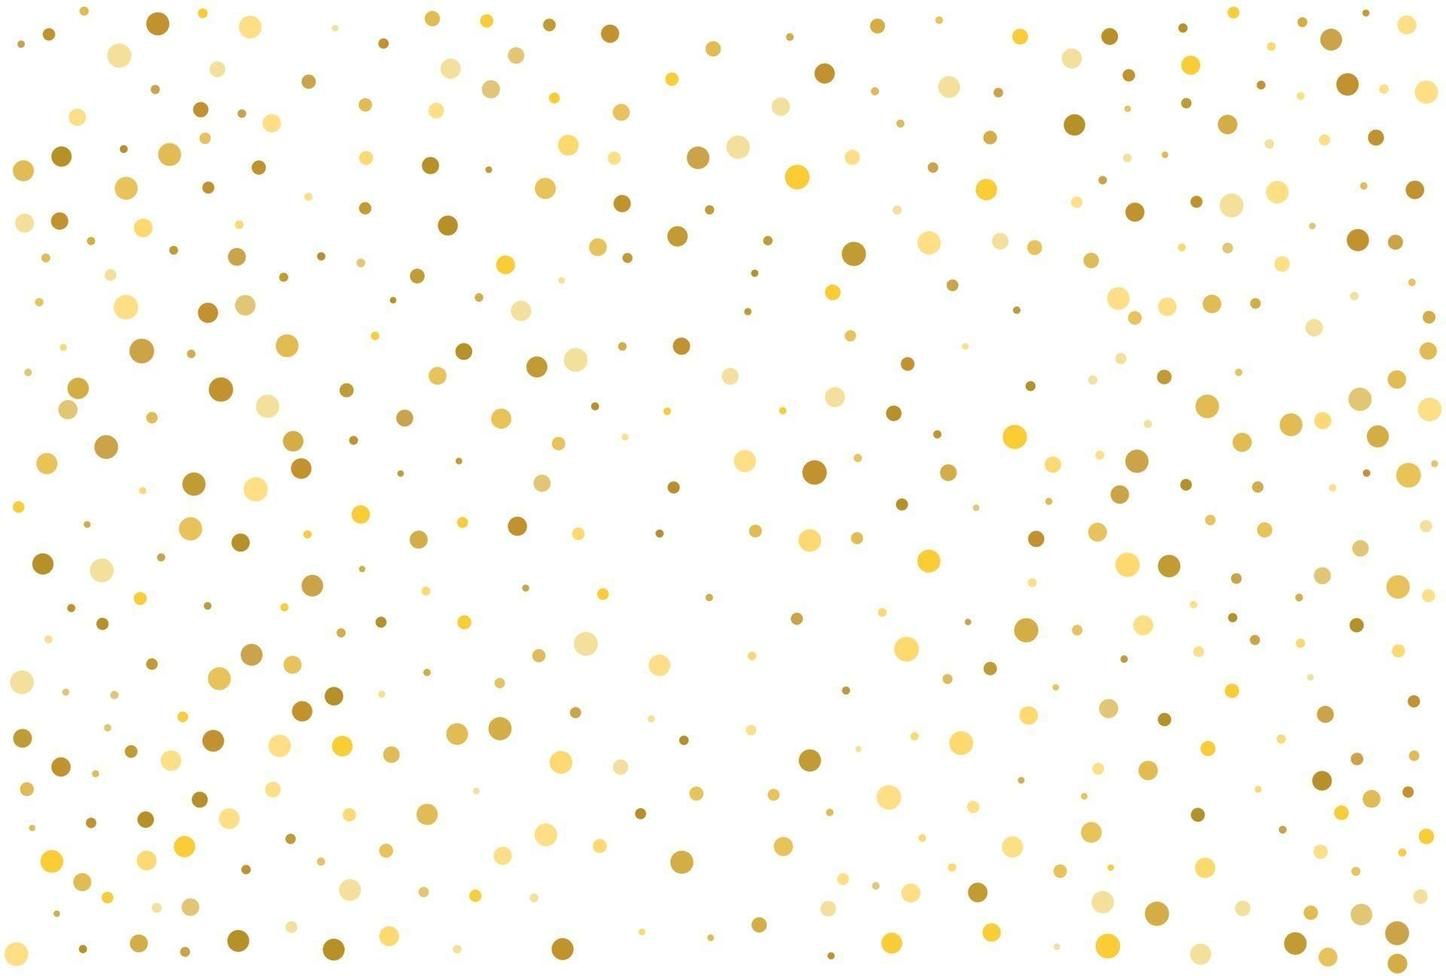 ouro glitter clássico círculo confete fundo vetor